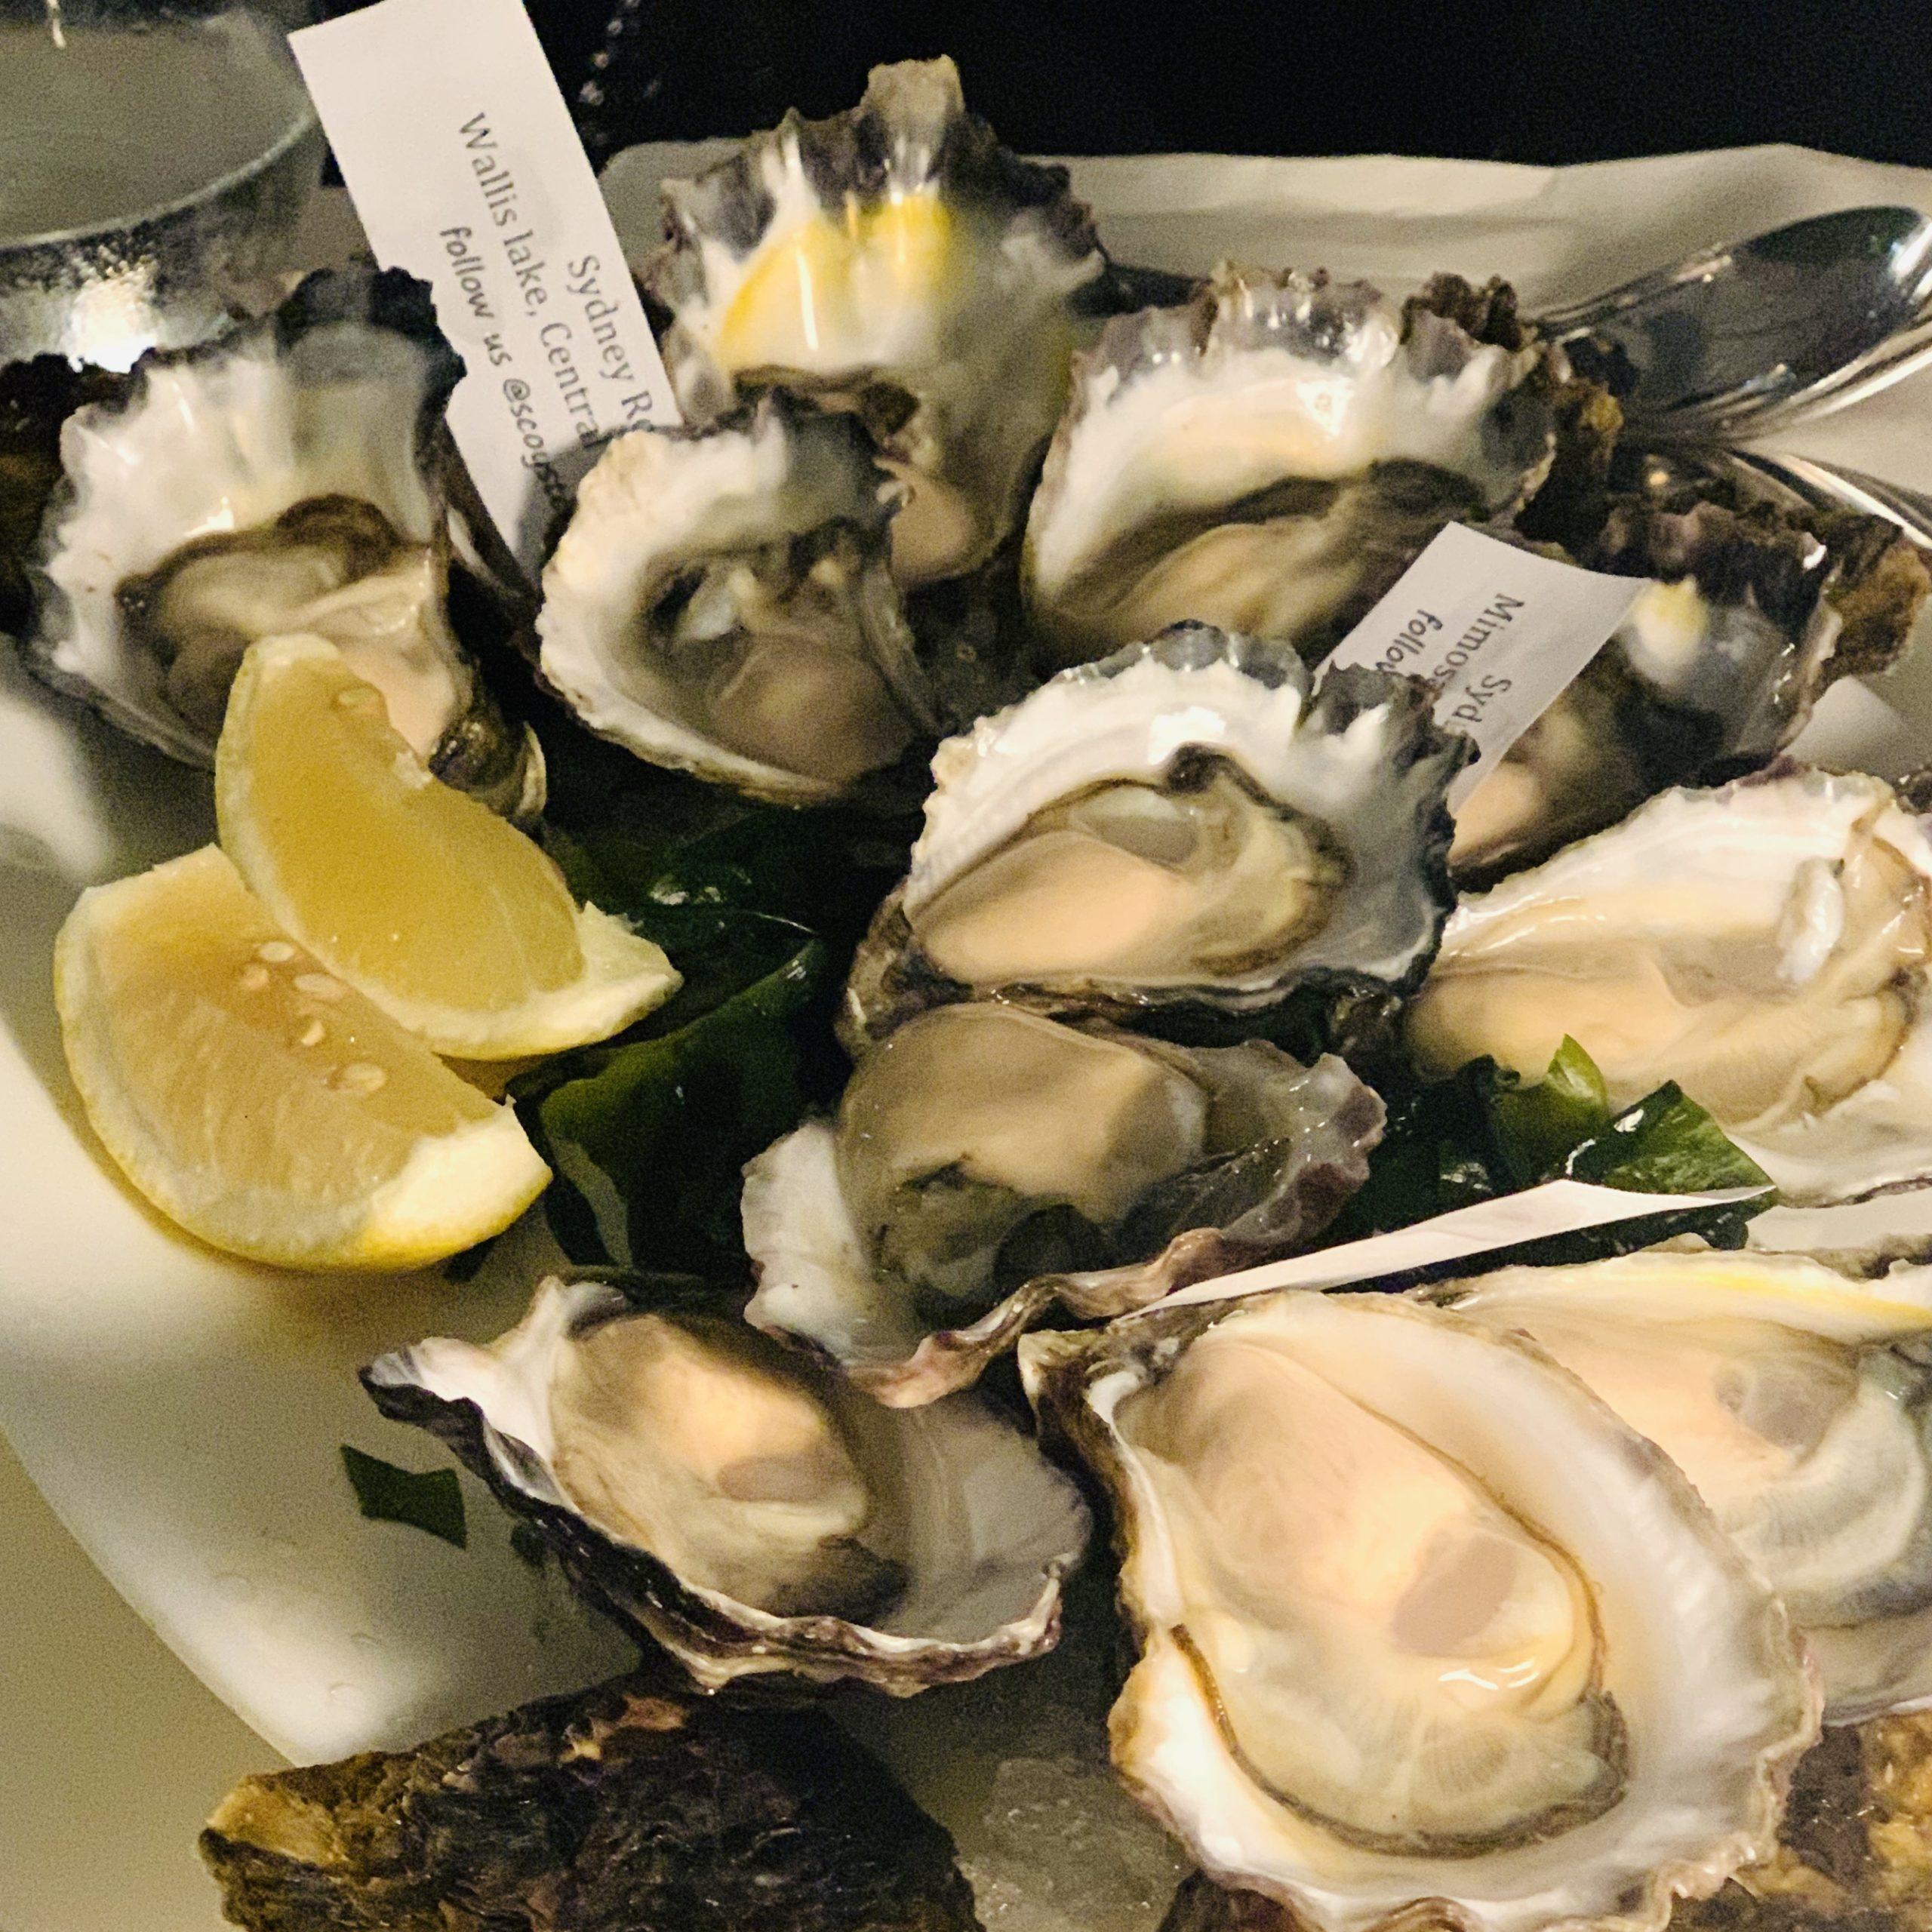 the sydney cove oyster bar Sydney シドニー サーキュラーキー 世界遺産 オペラハウス operahouse